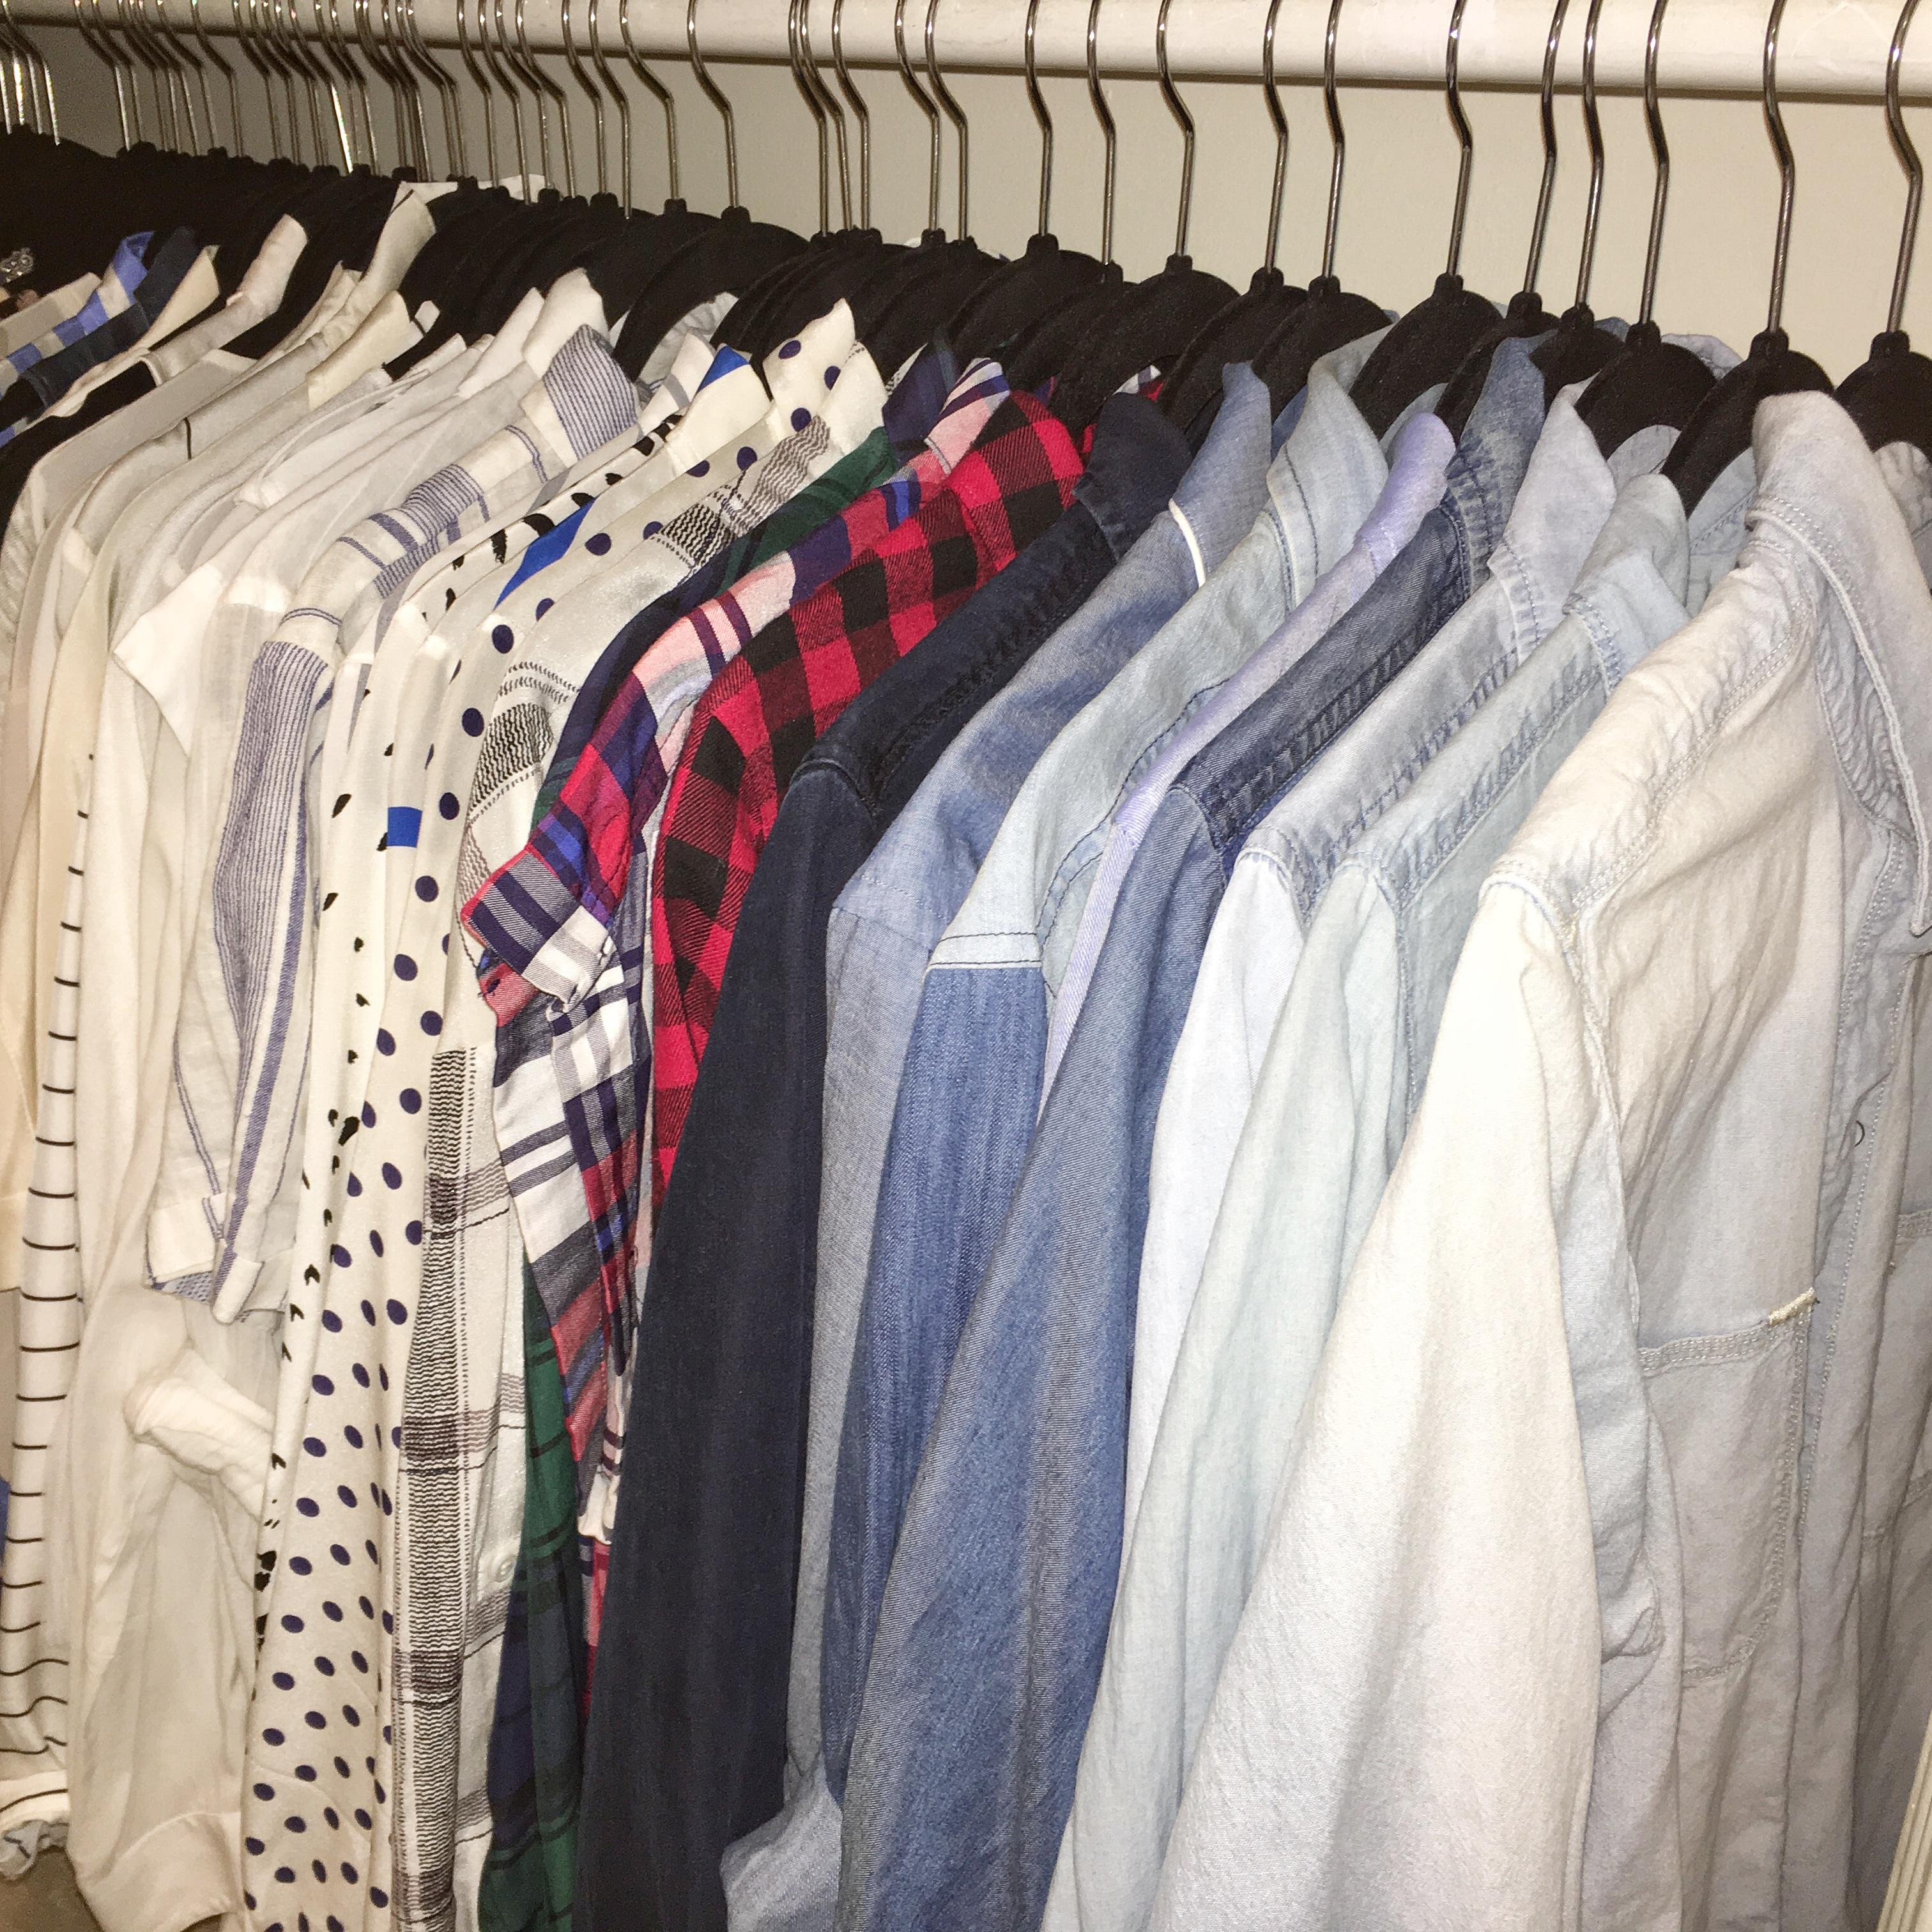 #denimfordays - organized closet